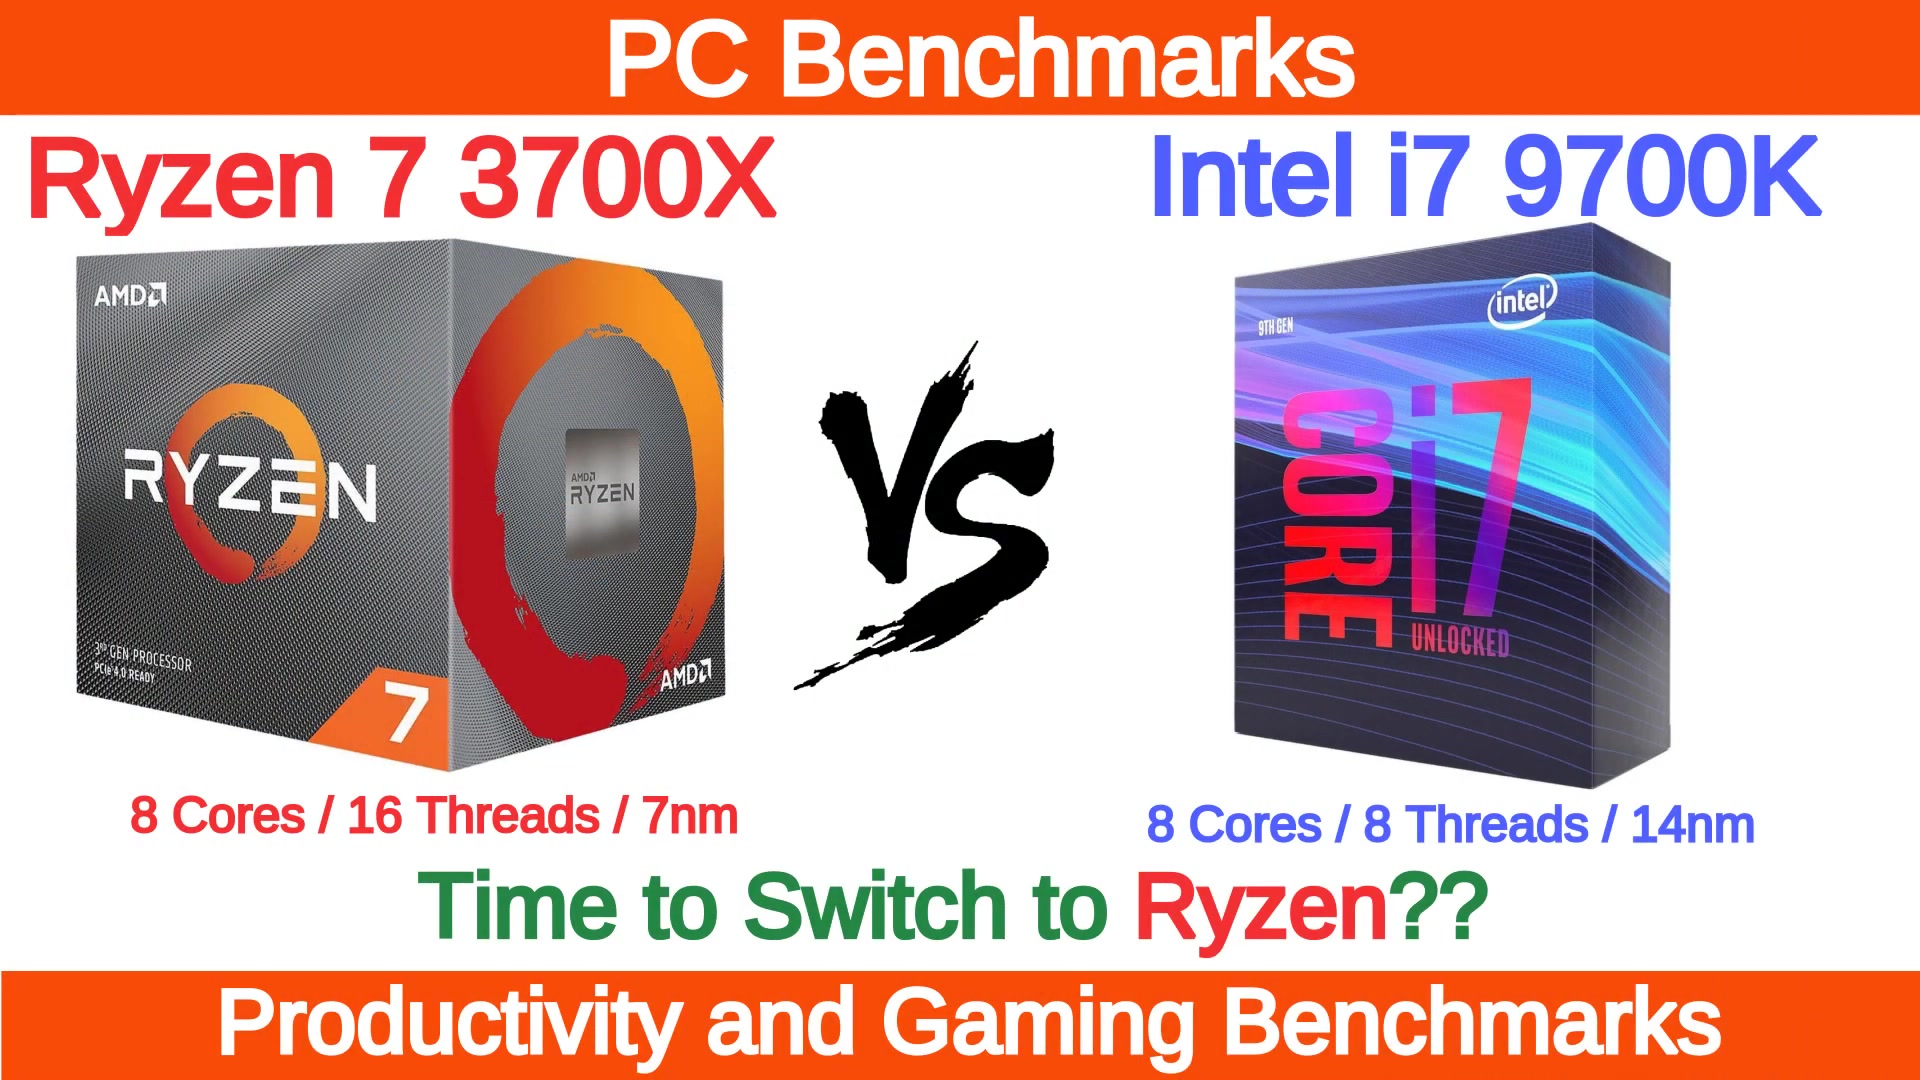 AMD Ryzen 7 3700X vs Intel i7 9700K Benchmarks_哔哩哔哩 (゜-゜)つロ 干杯~-bilibili